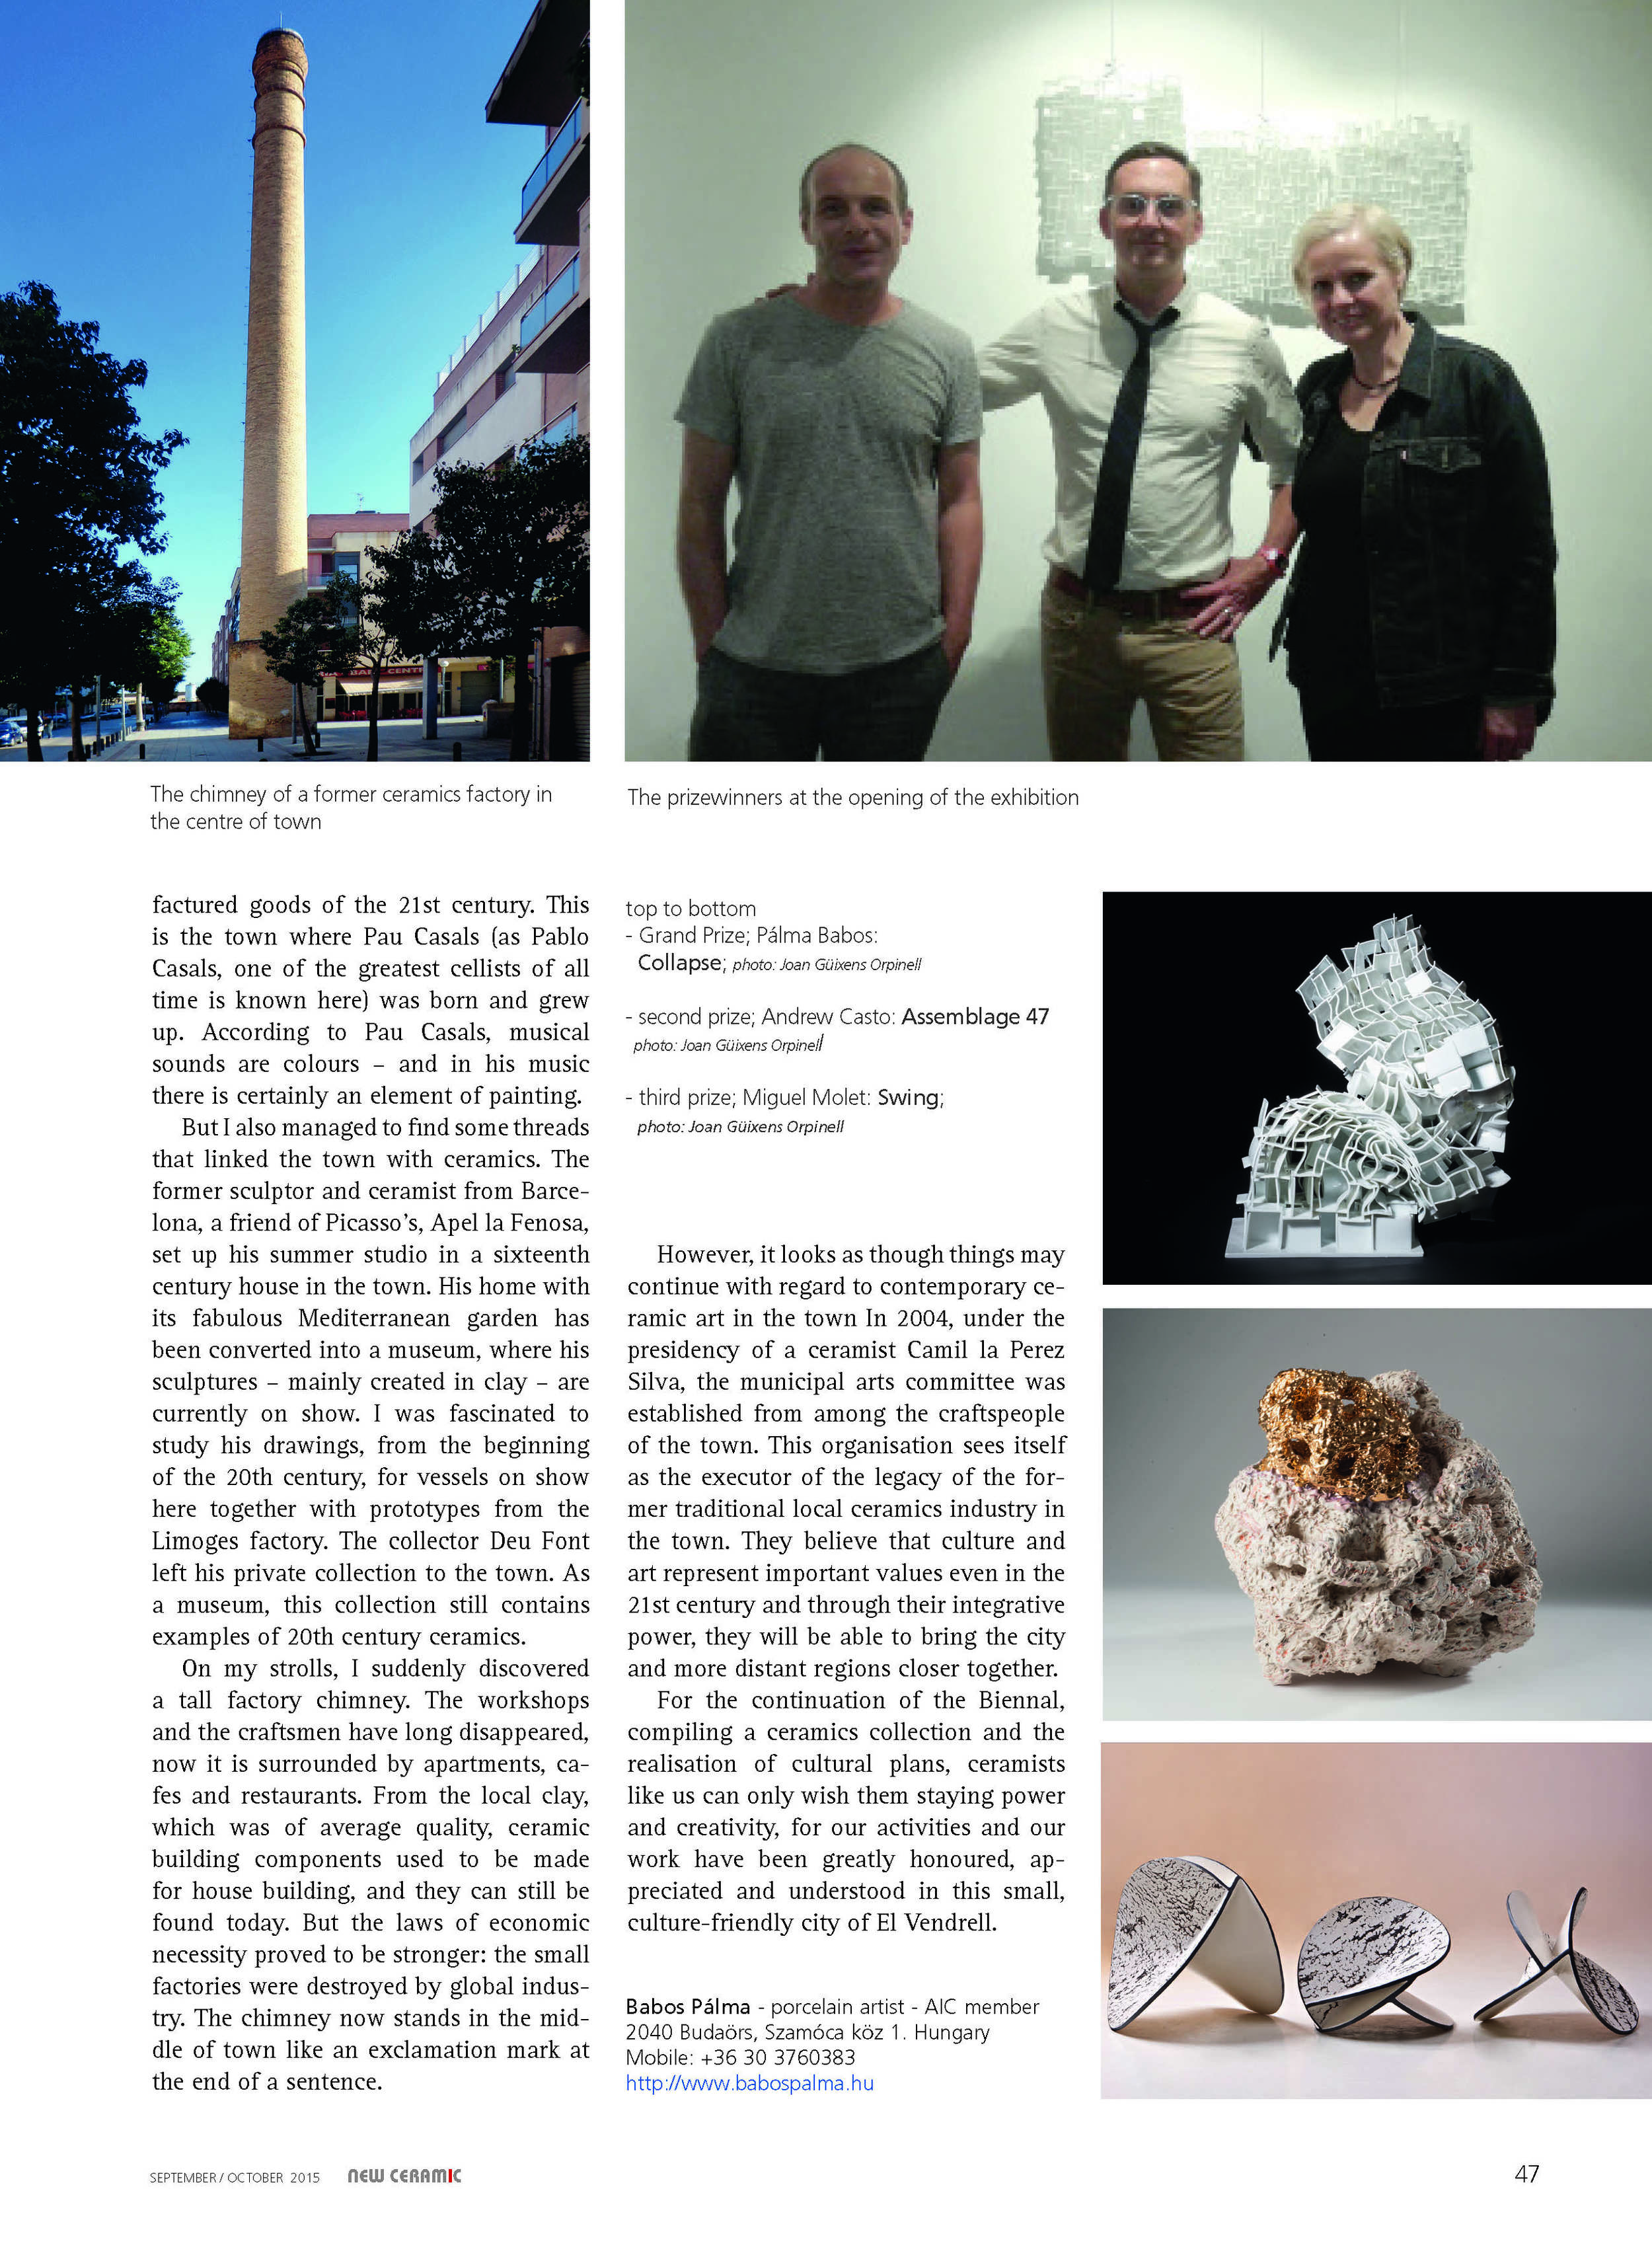 New Ceramic , September/October 2015 issue.